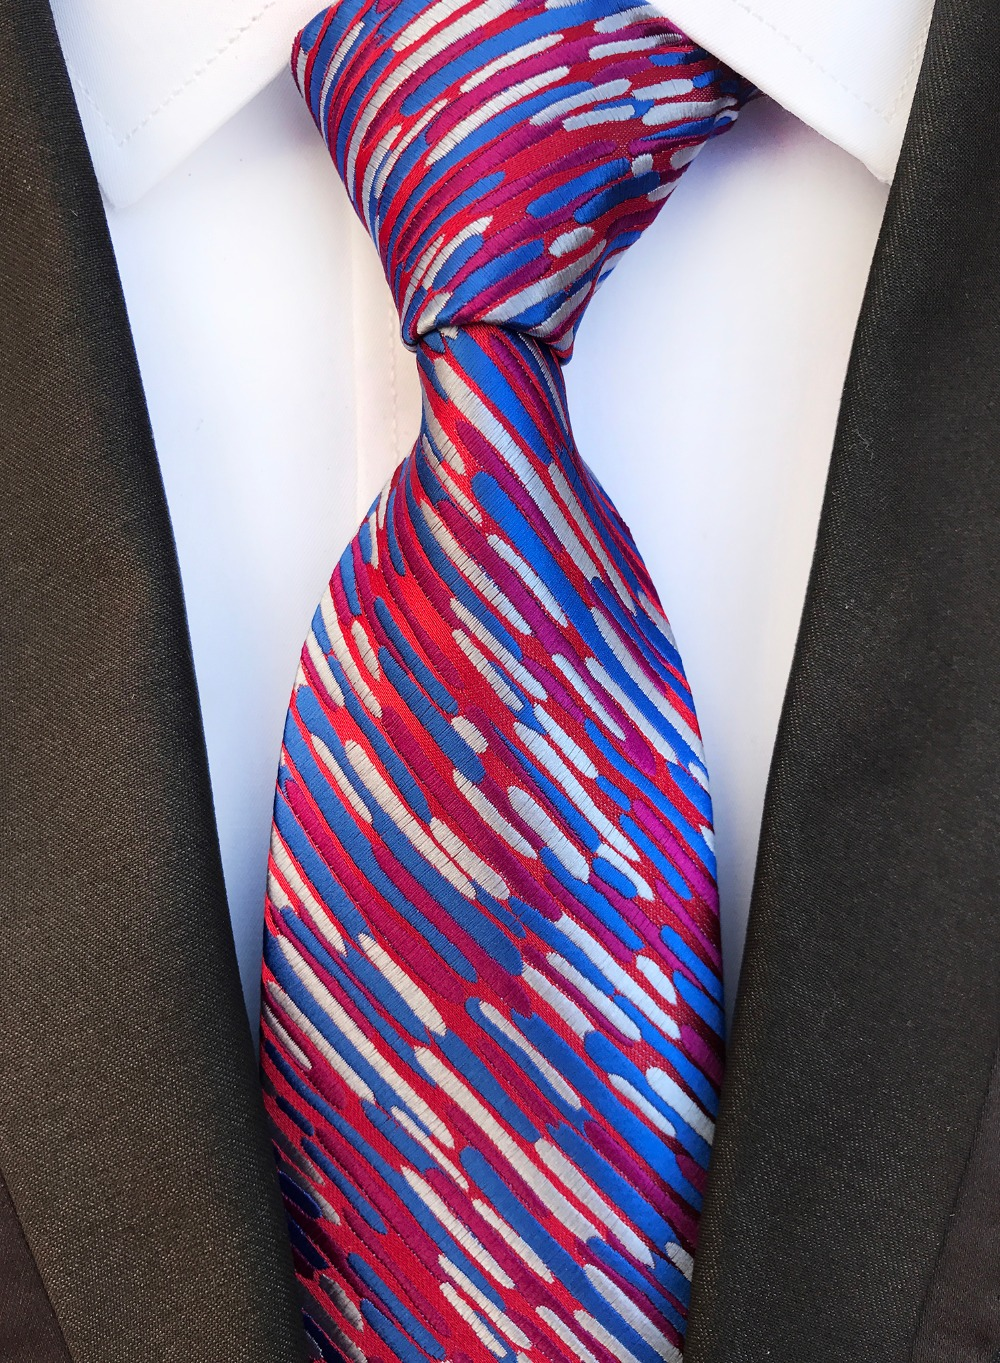 New Design Pattern Purple White Ties Jacquard Woven Silk Ties Men Neck Tie 8CM Tie For Men Wedding Suit Business Party Gravatas